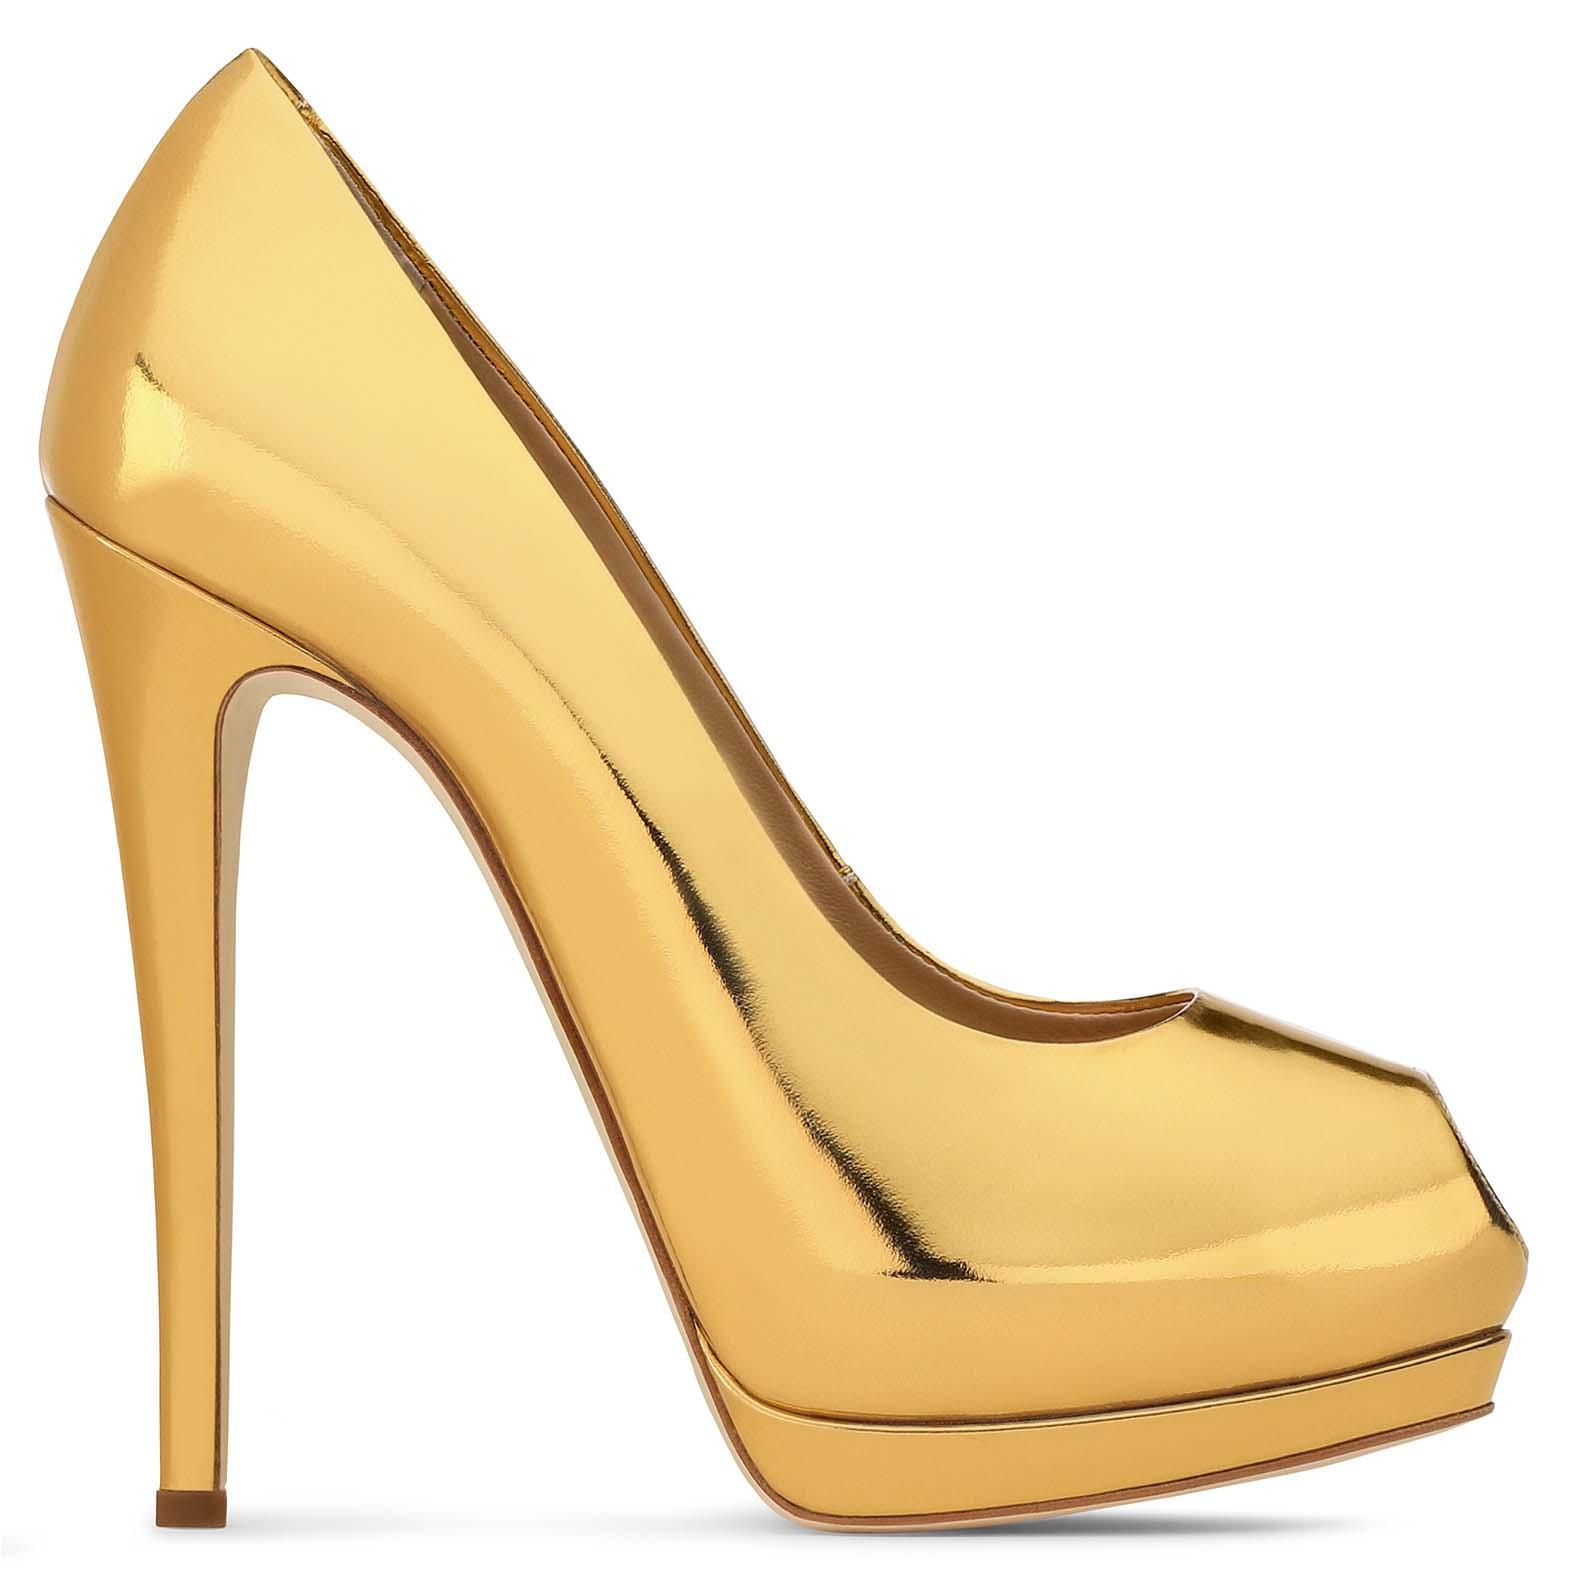 latest-party-wedding-wear-shoes-by-giuseppe-zanotti-2017-27